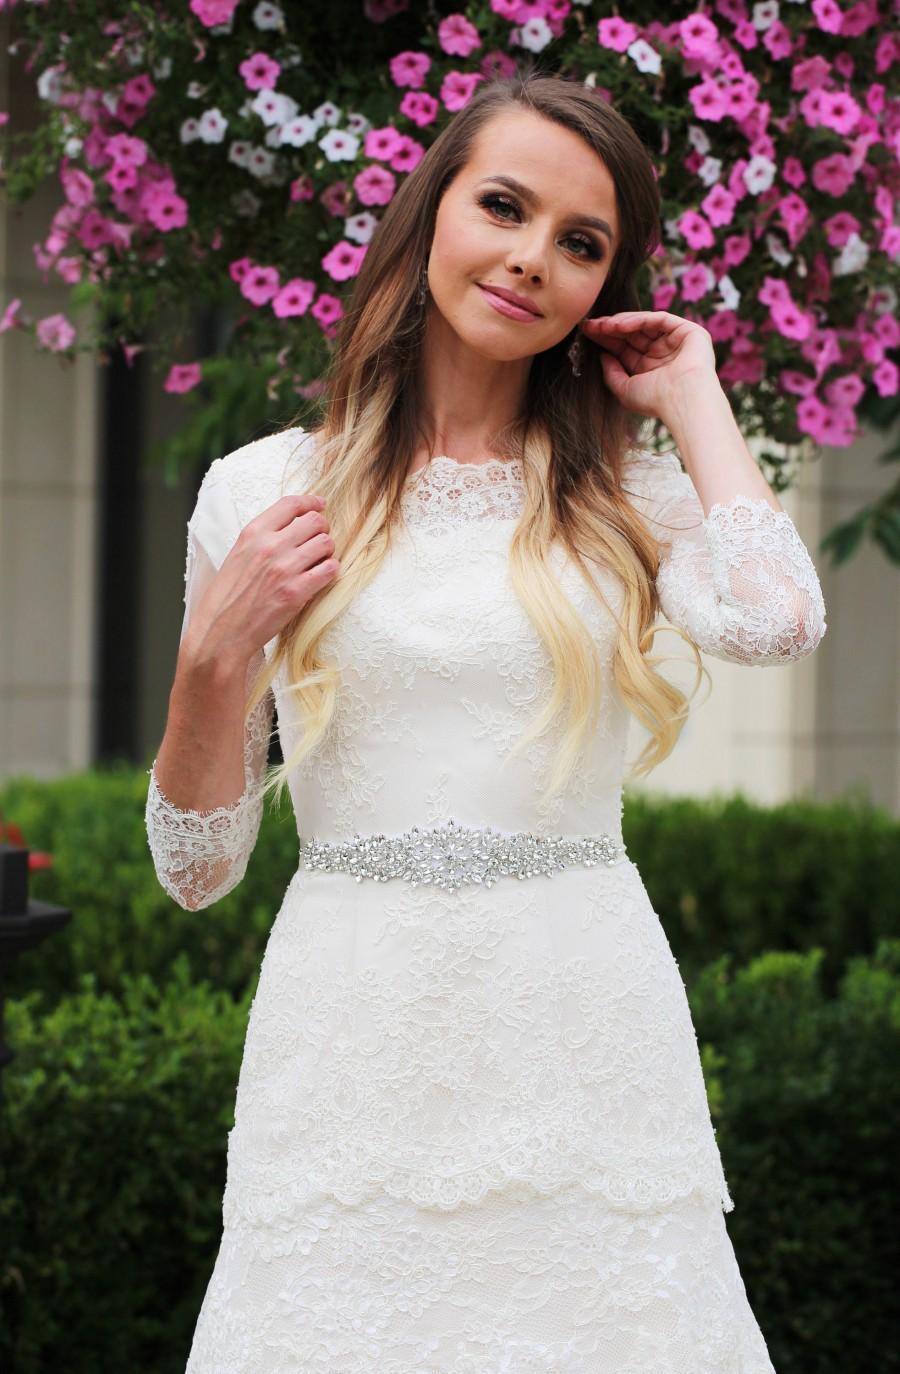 Mariage - Wedding belt  - bridal belt - bridal sash - wedding sash - rhinestone sash - crystal sash - rhinestone bridal belt - bridal sashes and belts